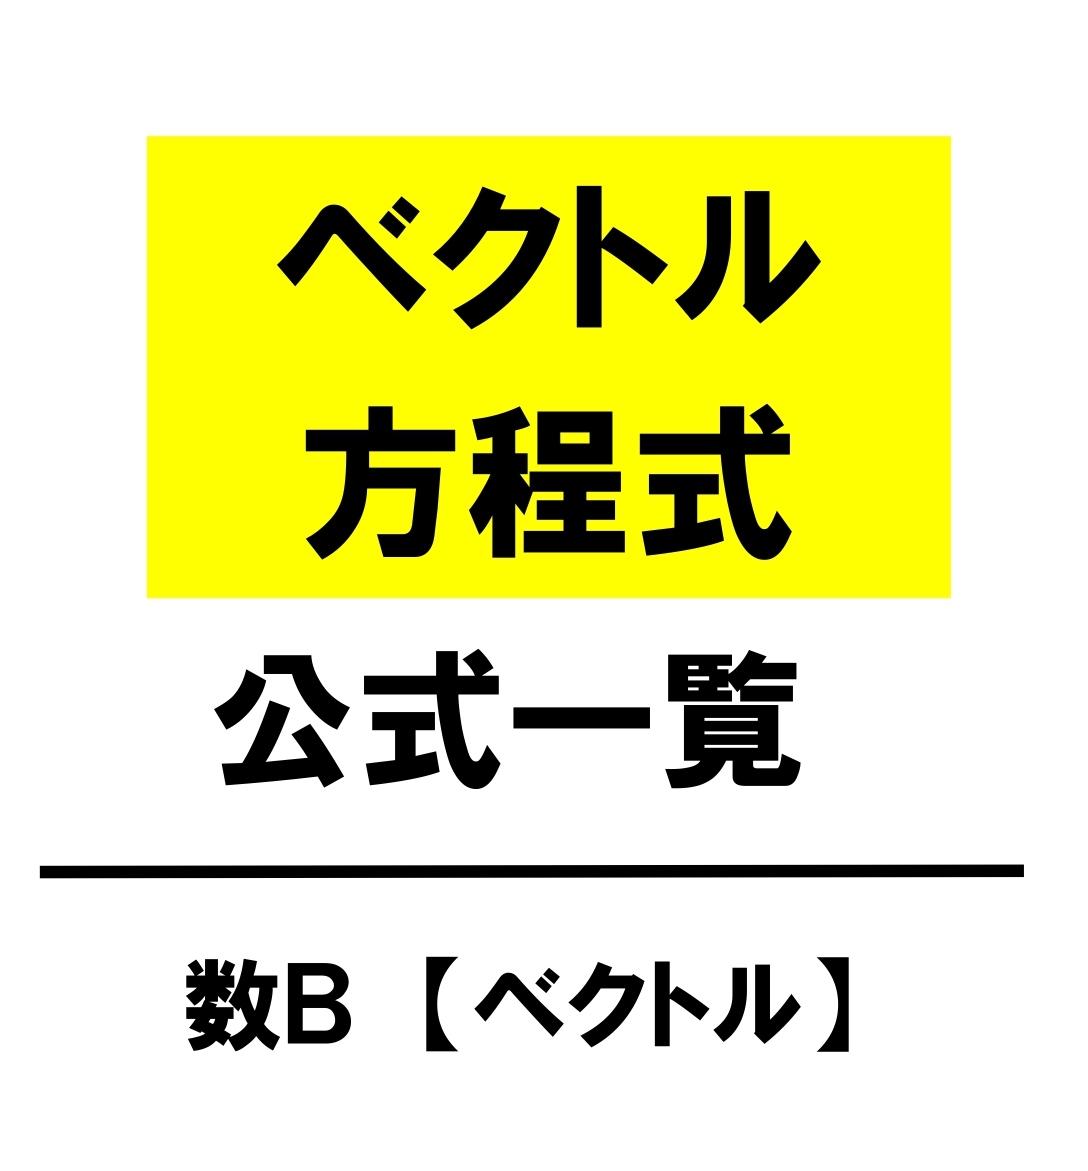 【高校数学B】ベクトル方程式 公式一覧(直線・円・存在範囲)